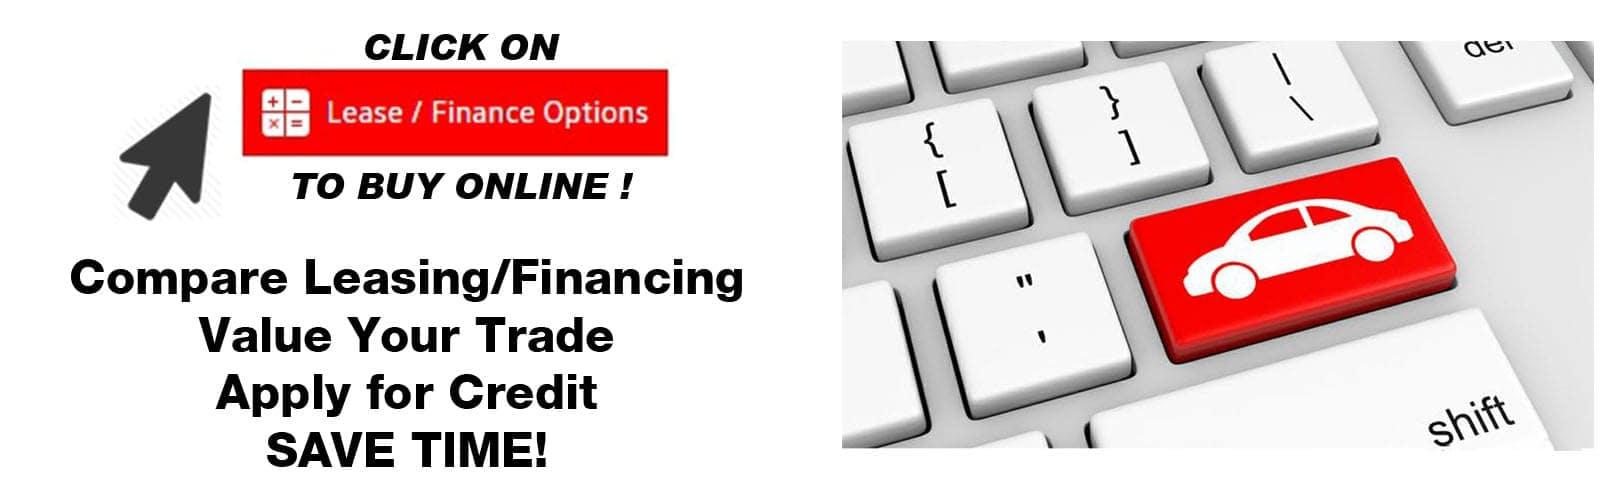 lease_finance_button_1600x500